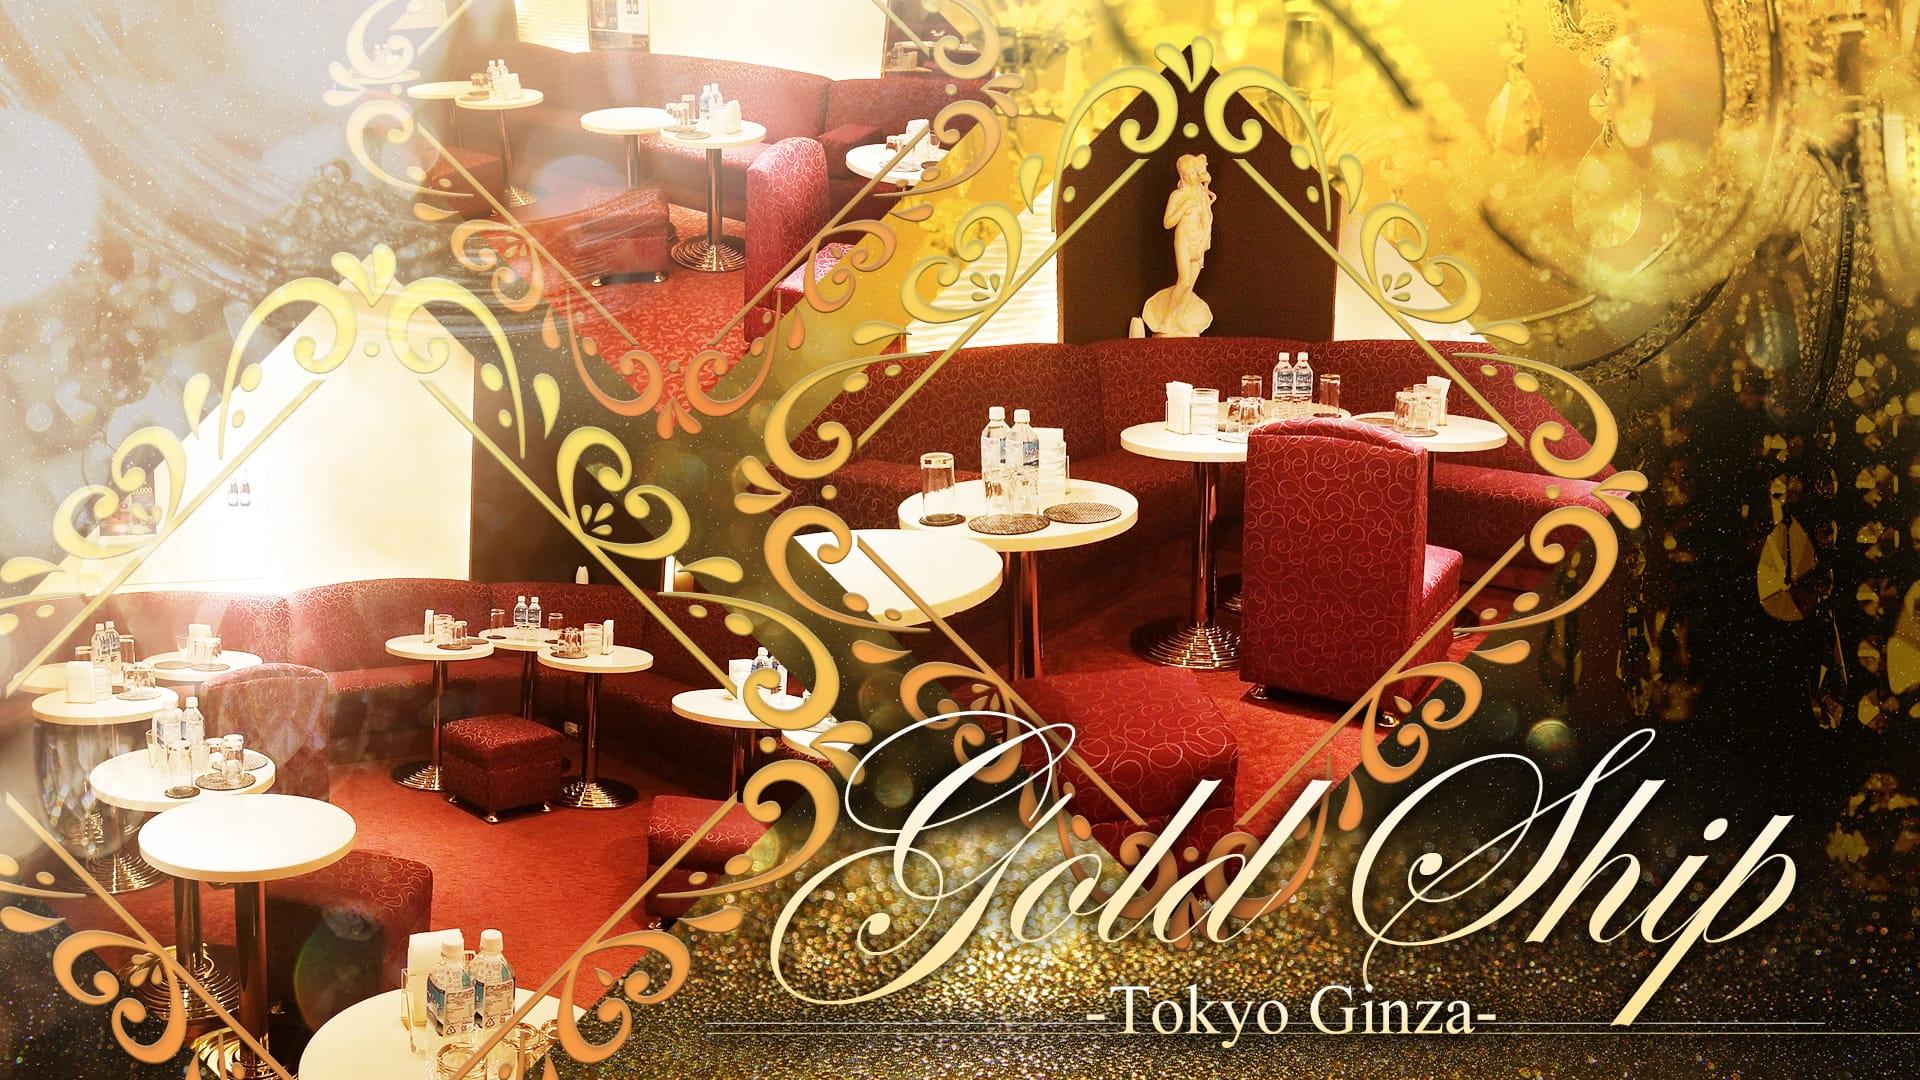 GOLD SHIP(ゴールドシップ) 銀座ニュークラブ TOP画像